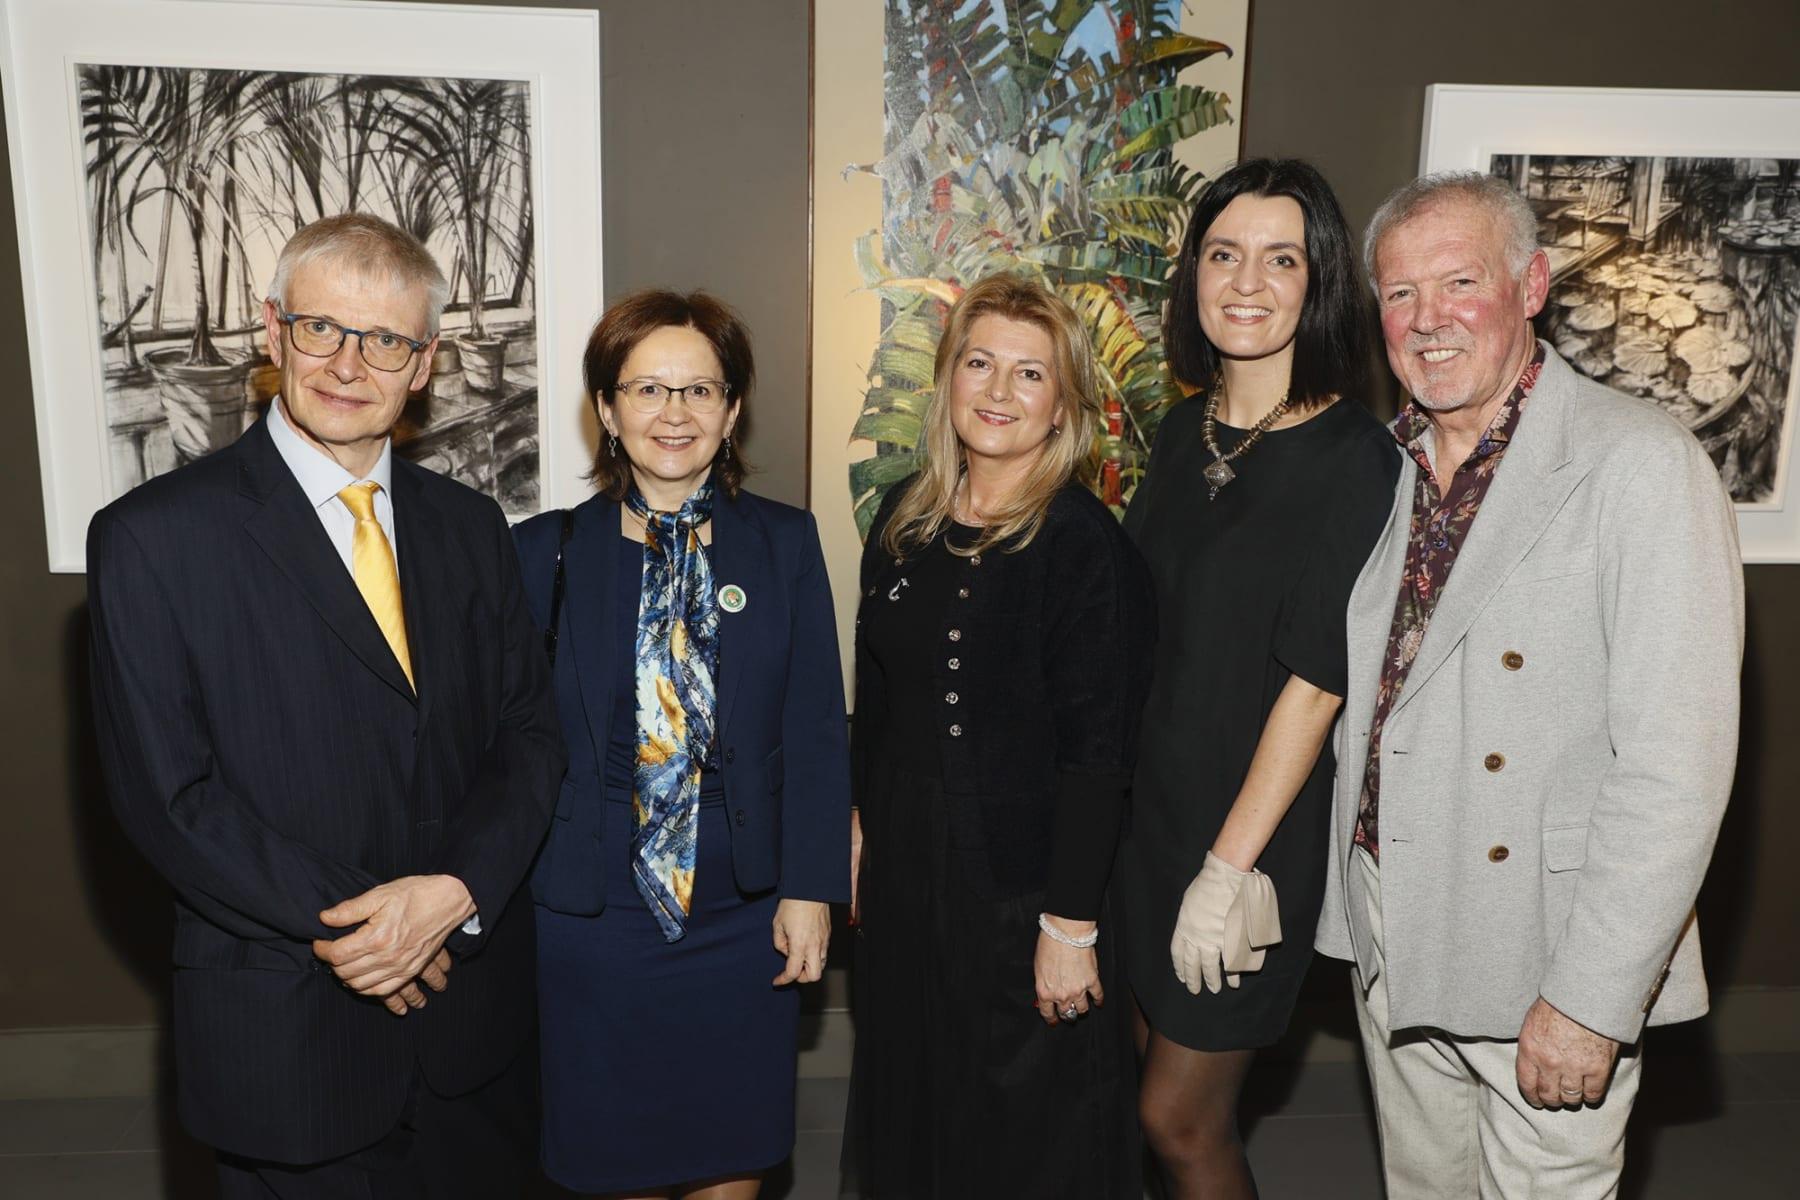 British Ambassador Robin Barnett, Polish Ambassador Anna Sochanska, Agnieszka Kepka, Agata and Gerad Byrne and at the opening of the 'Botanical Fusion. Singapore to Dublin' Exhibition